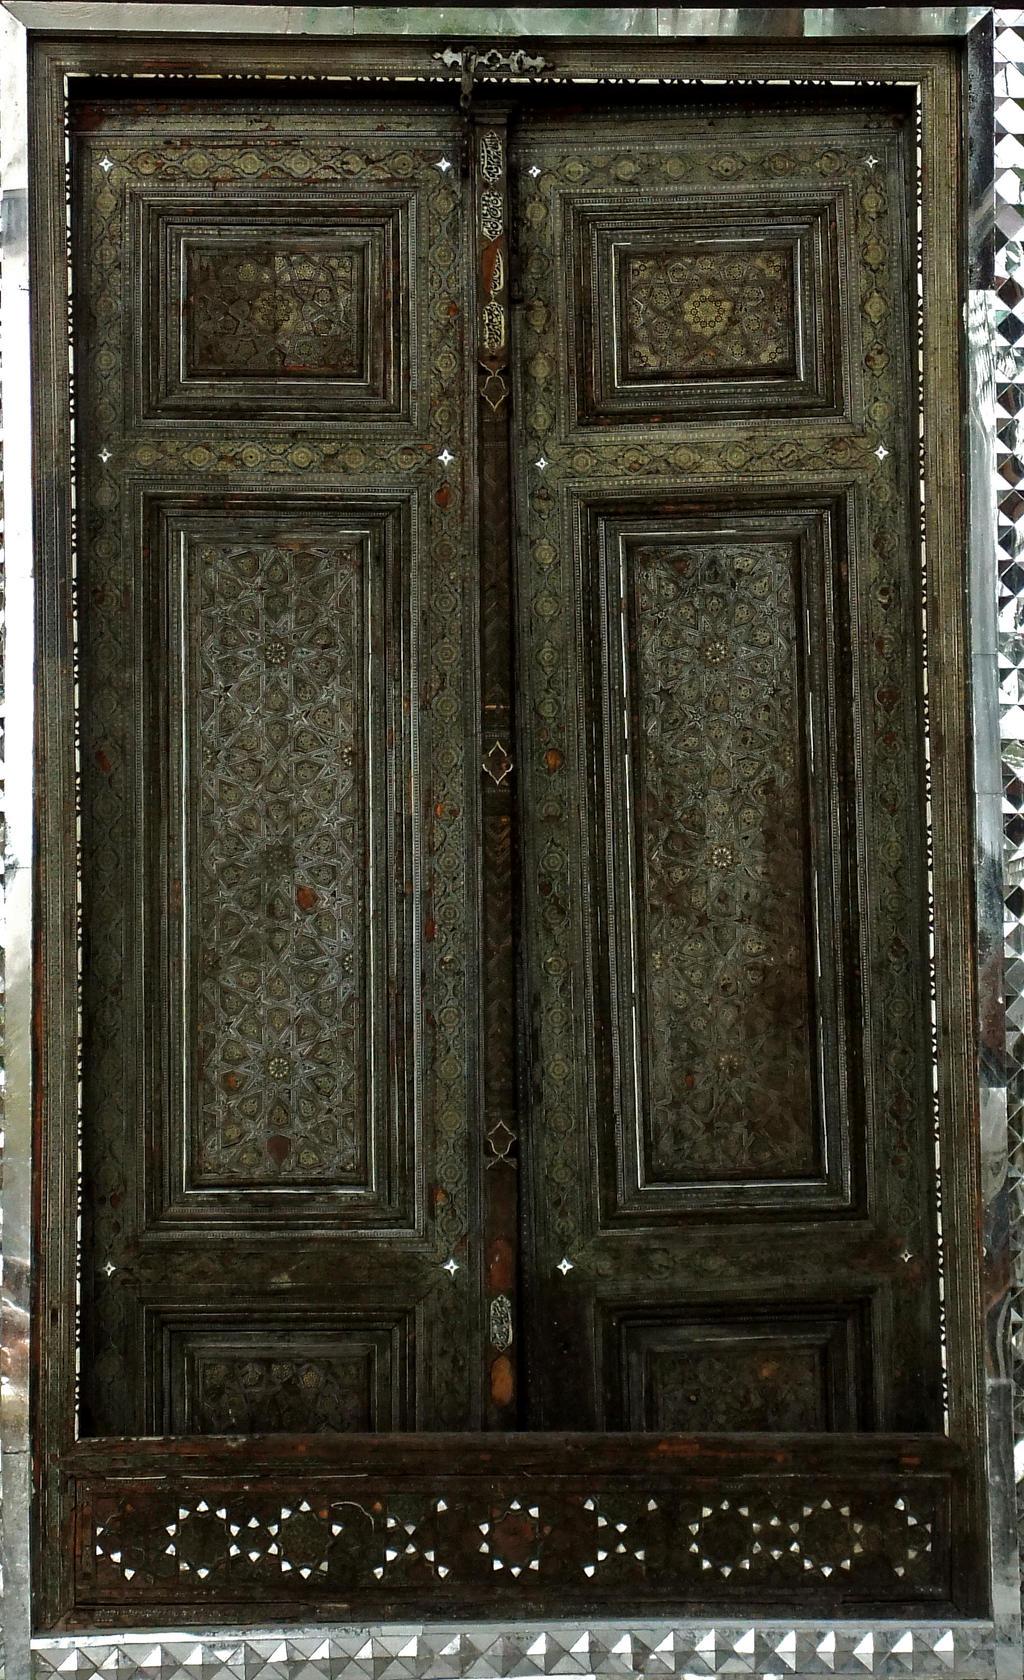 ... Persian Architecture 03 - Ornate Wooden Door by fuguestock & Persian Architecture 03 - Ornate Wooden Door by fuguestock on DeviantArt